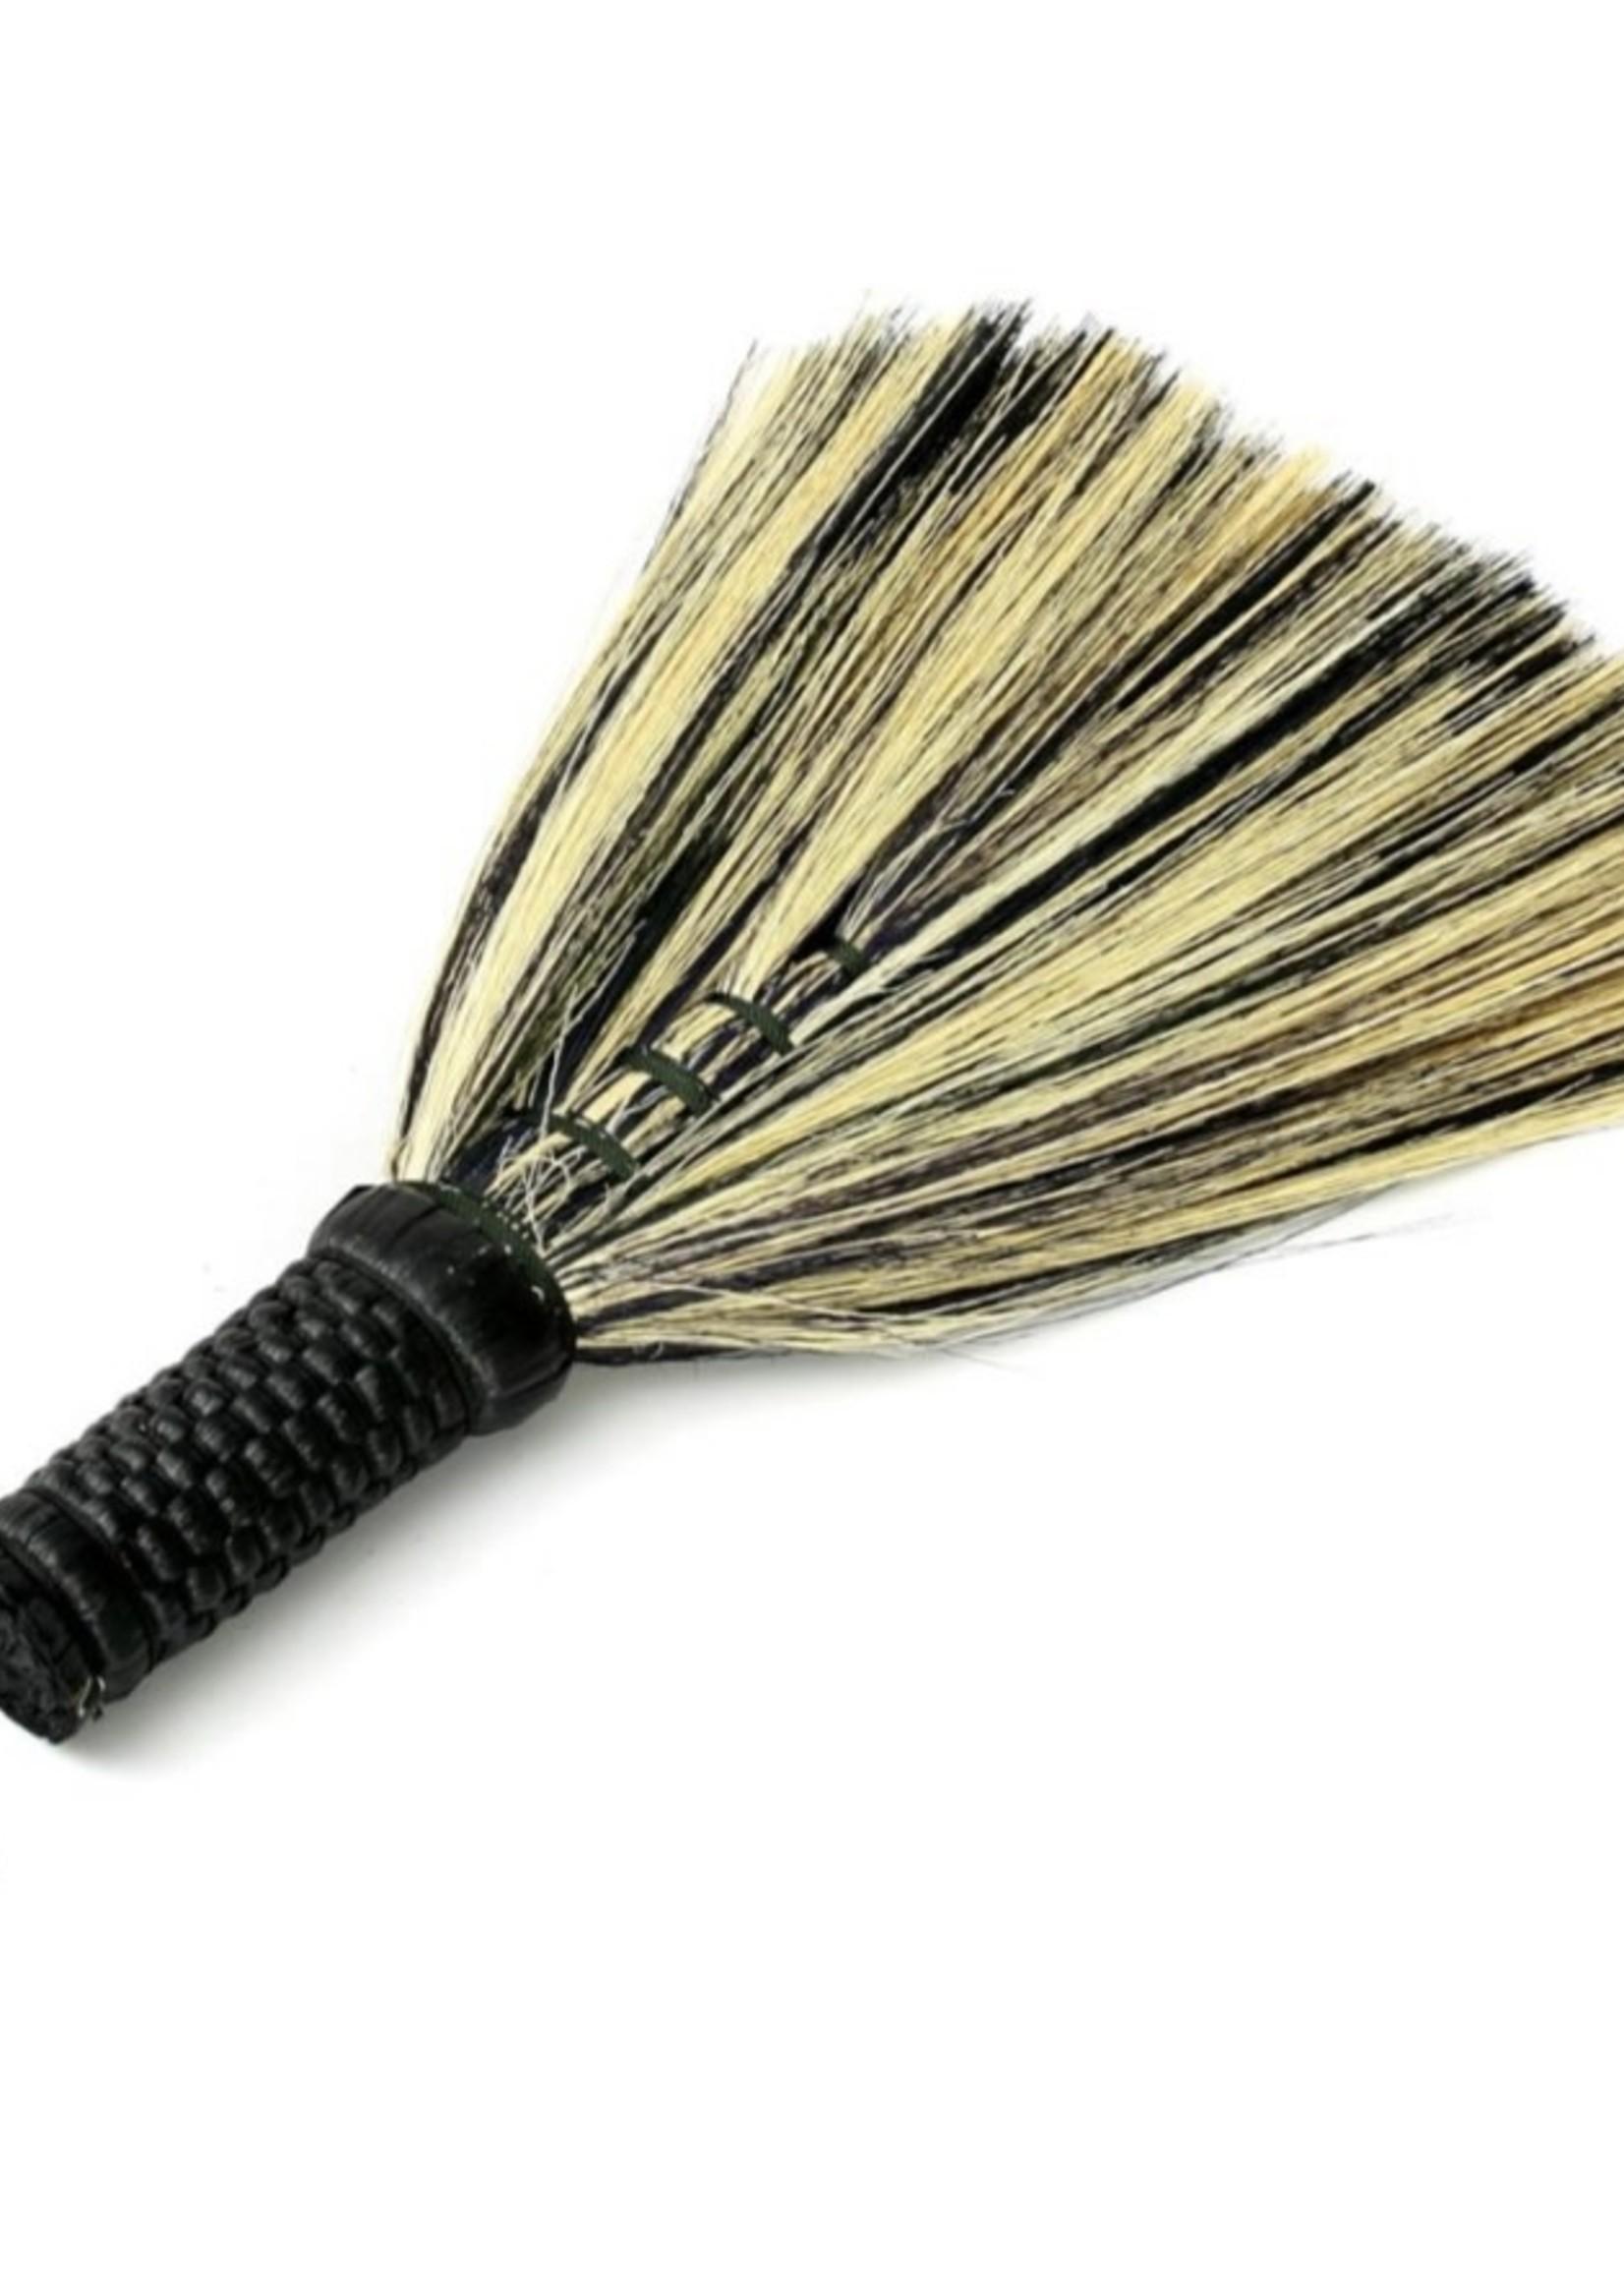 Guts & Goats Sweeping Brush Black- Natural